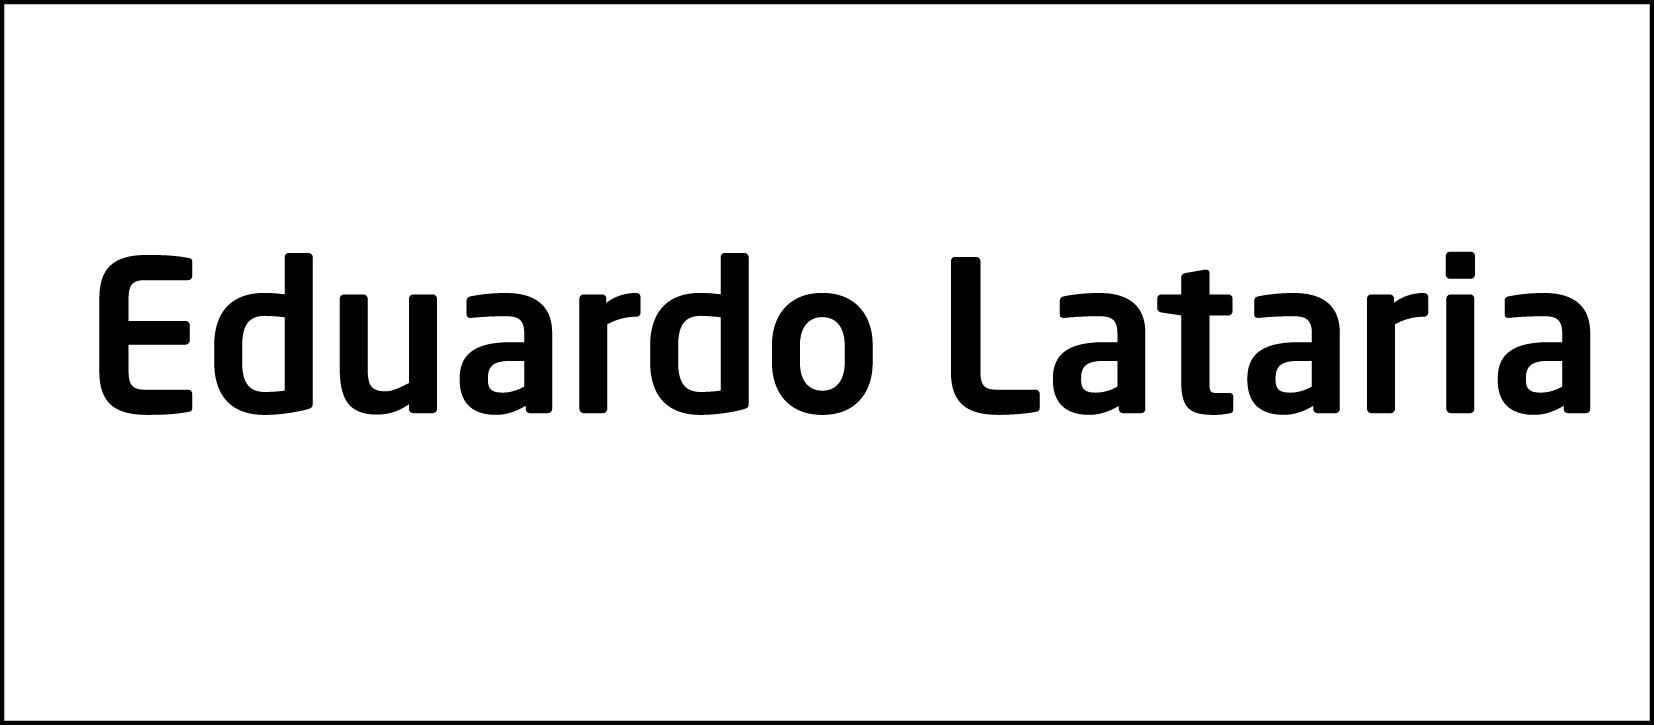 Eduardo Lataria